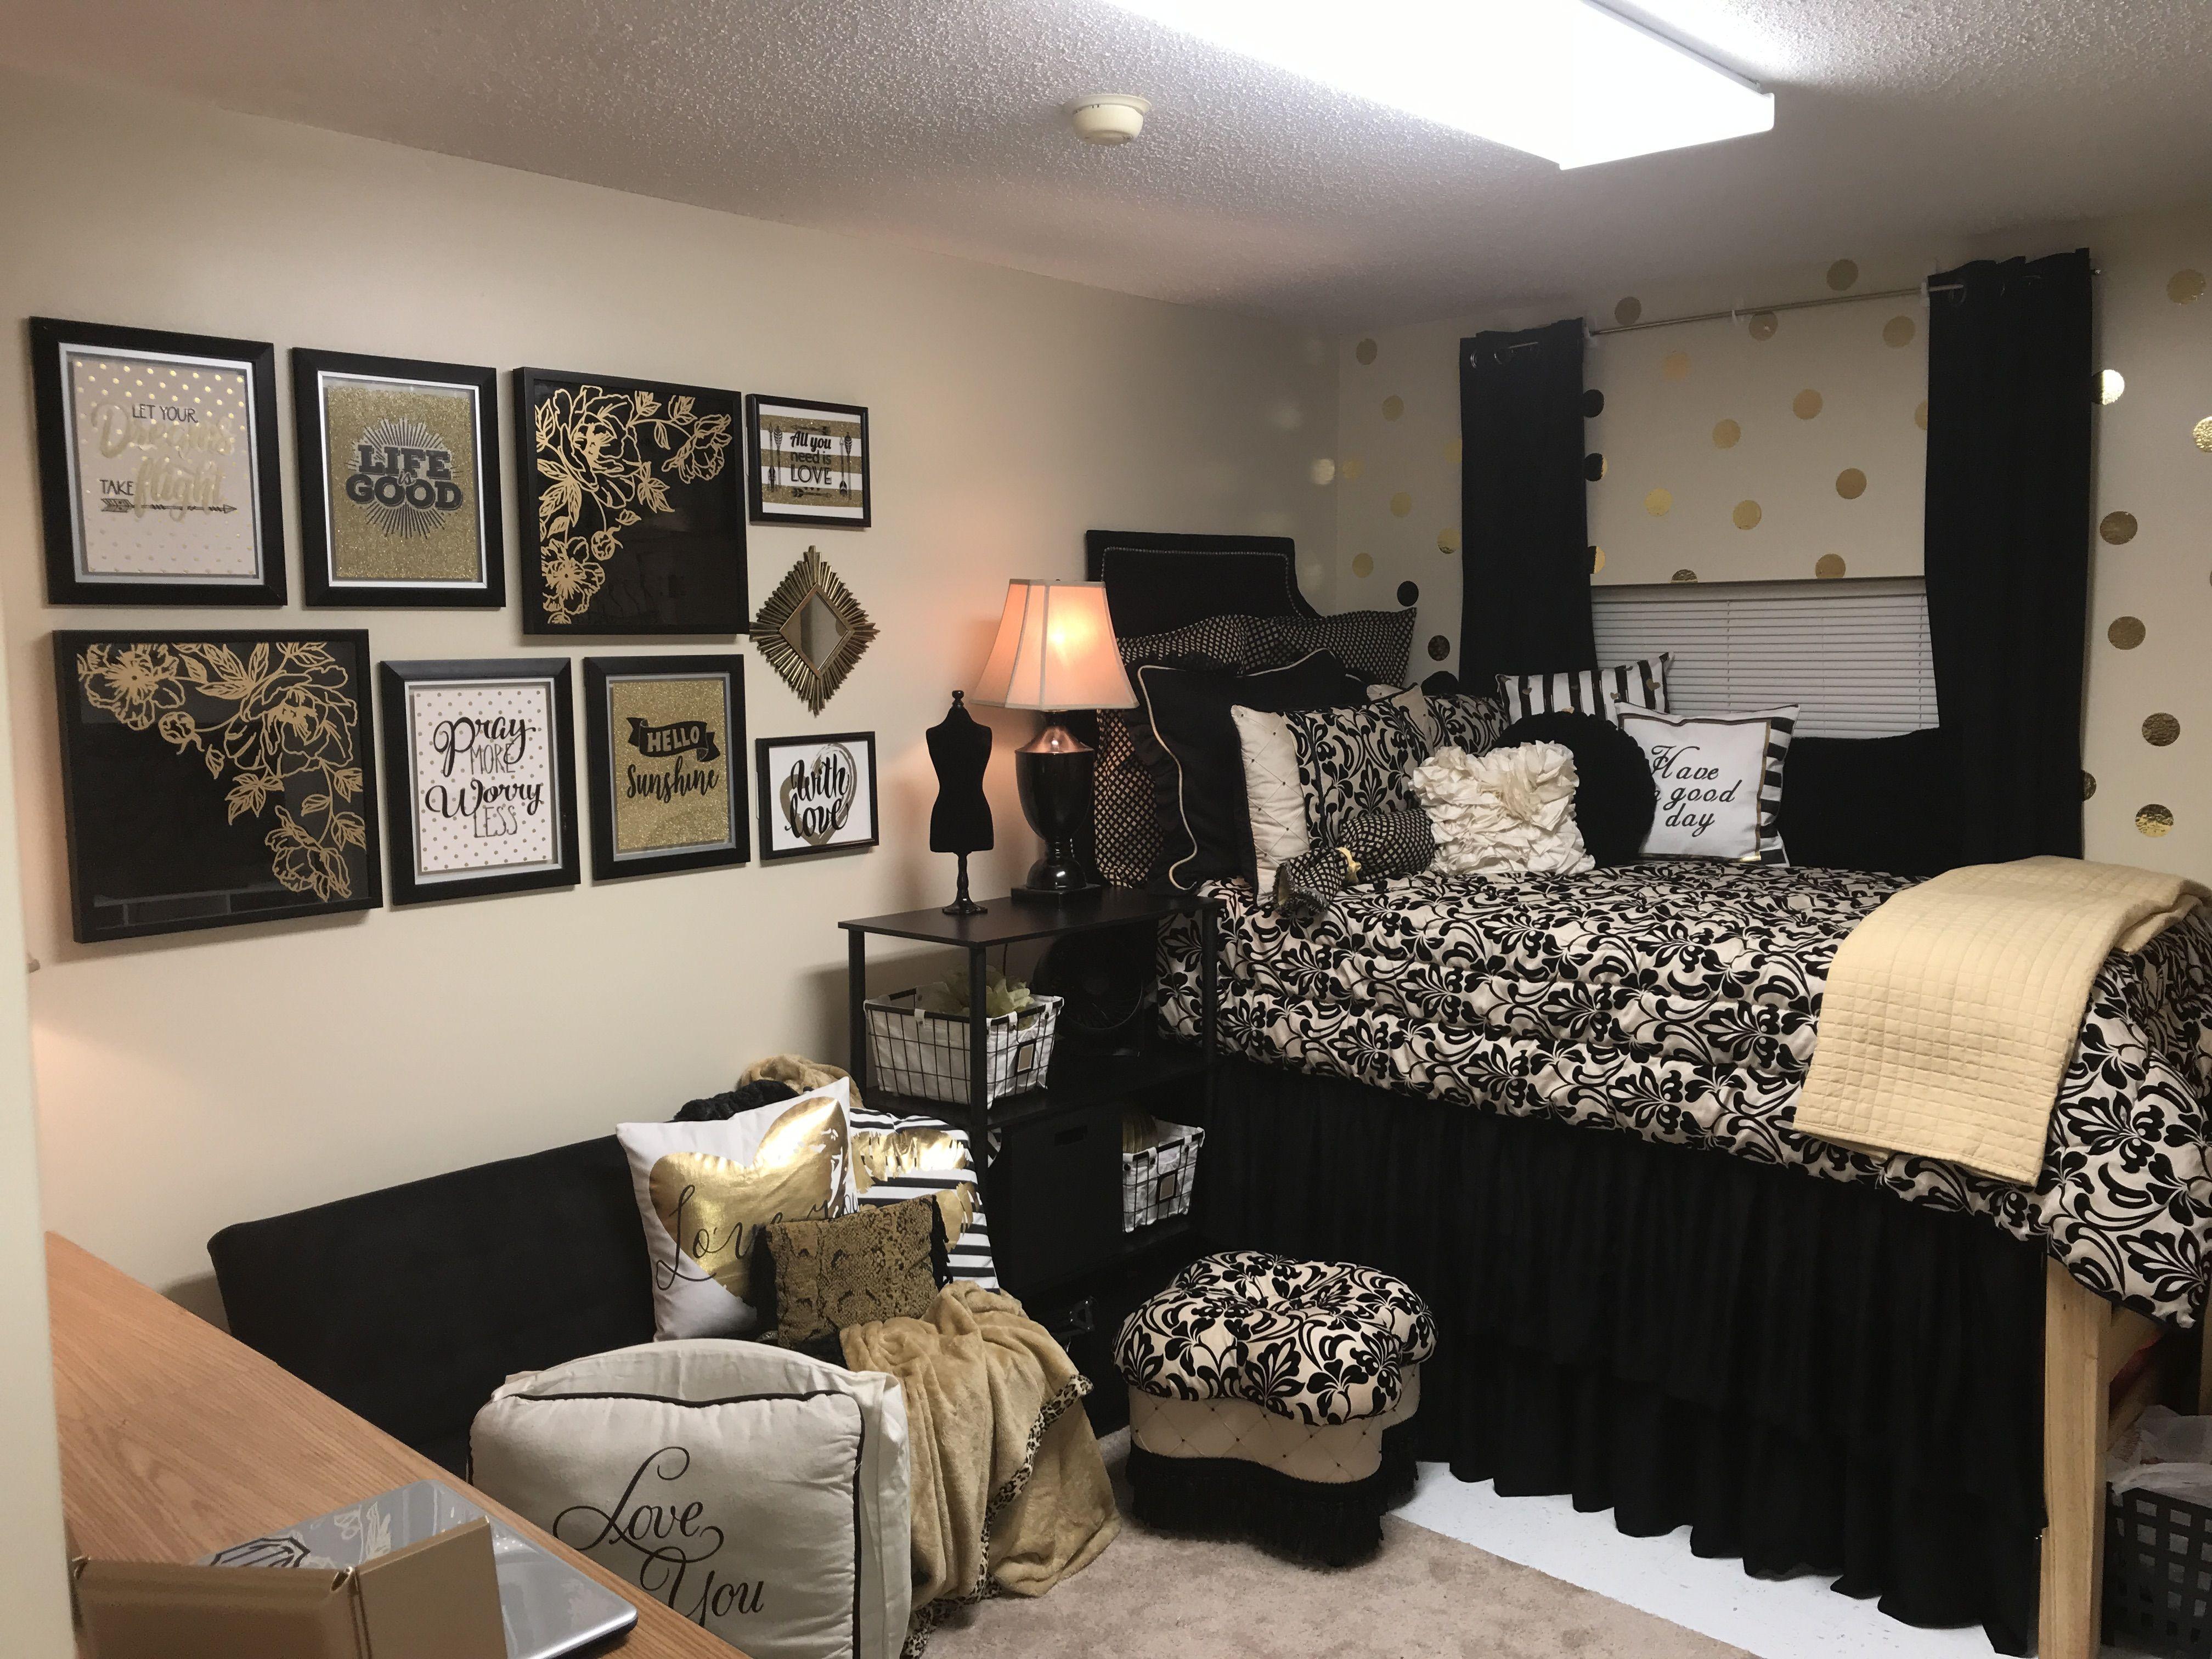 Dorm Room Tour 2018 Ncat Dorm Room Wall Decor College Living Rooms College Living Room Decor